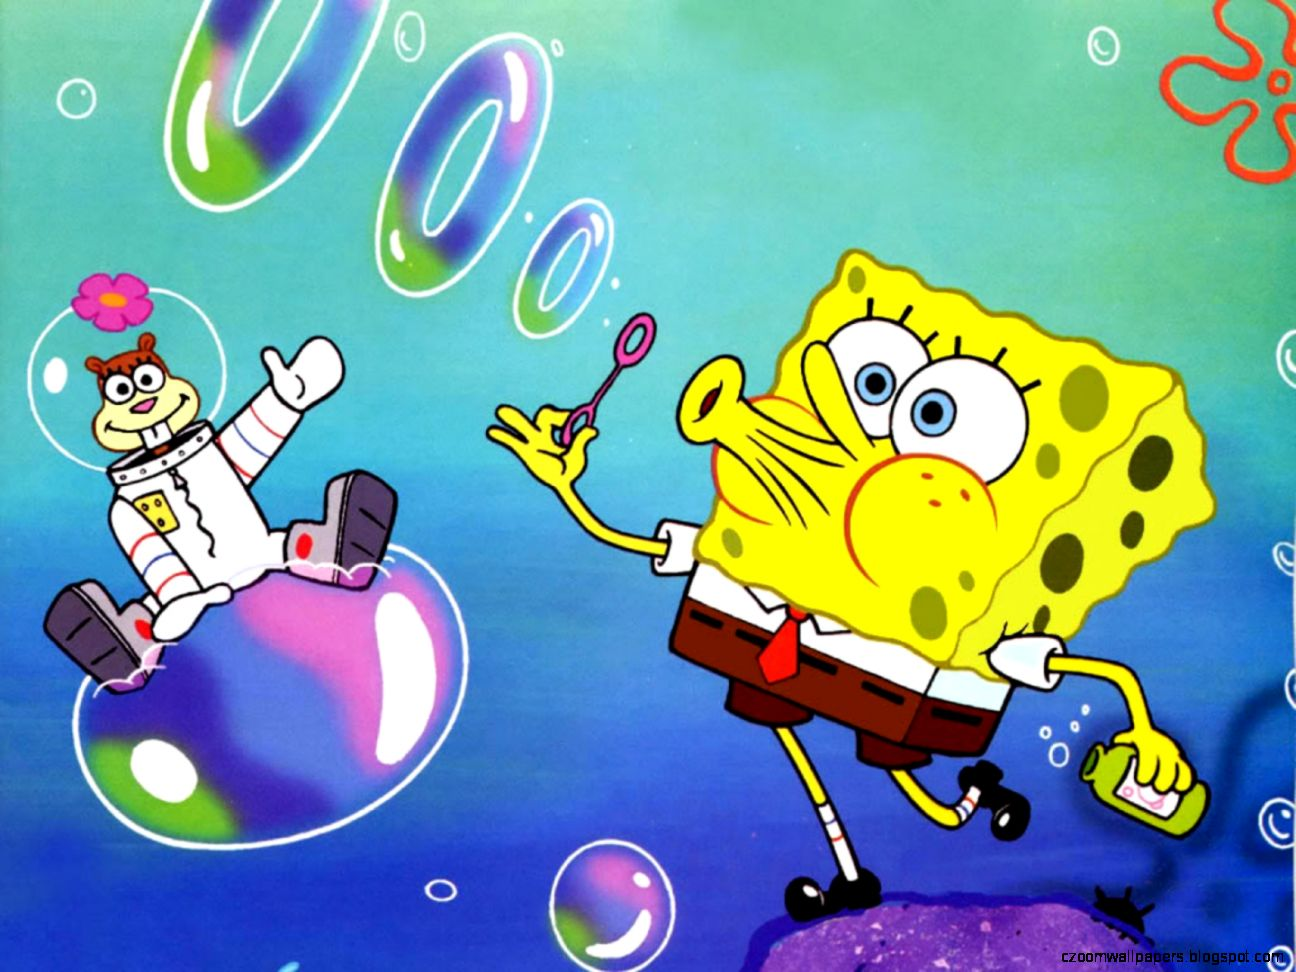 63 Spongebob Squarepants HD Wallpapers  Backgrounds   Wallpaper Abyss